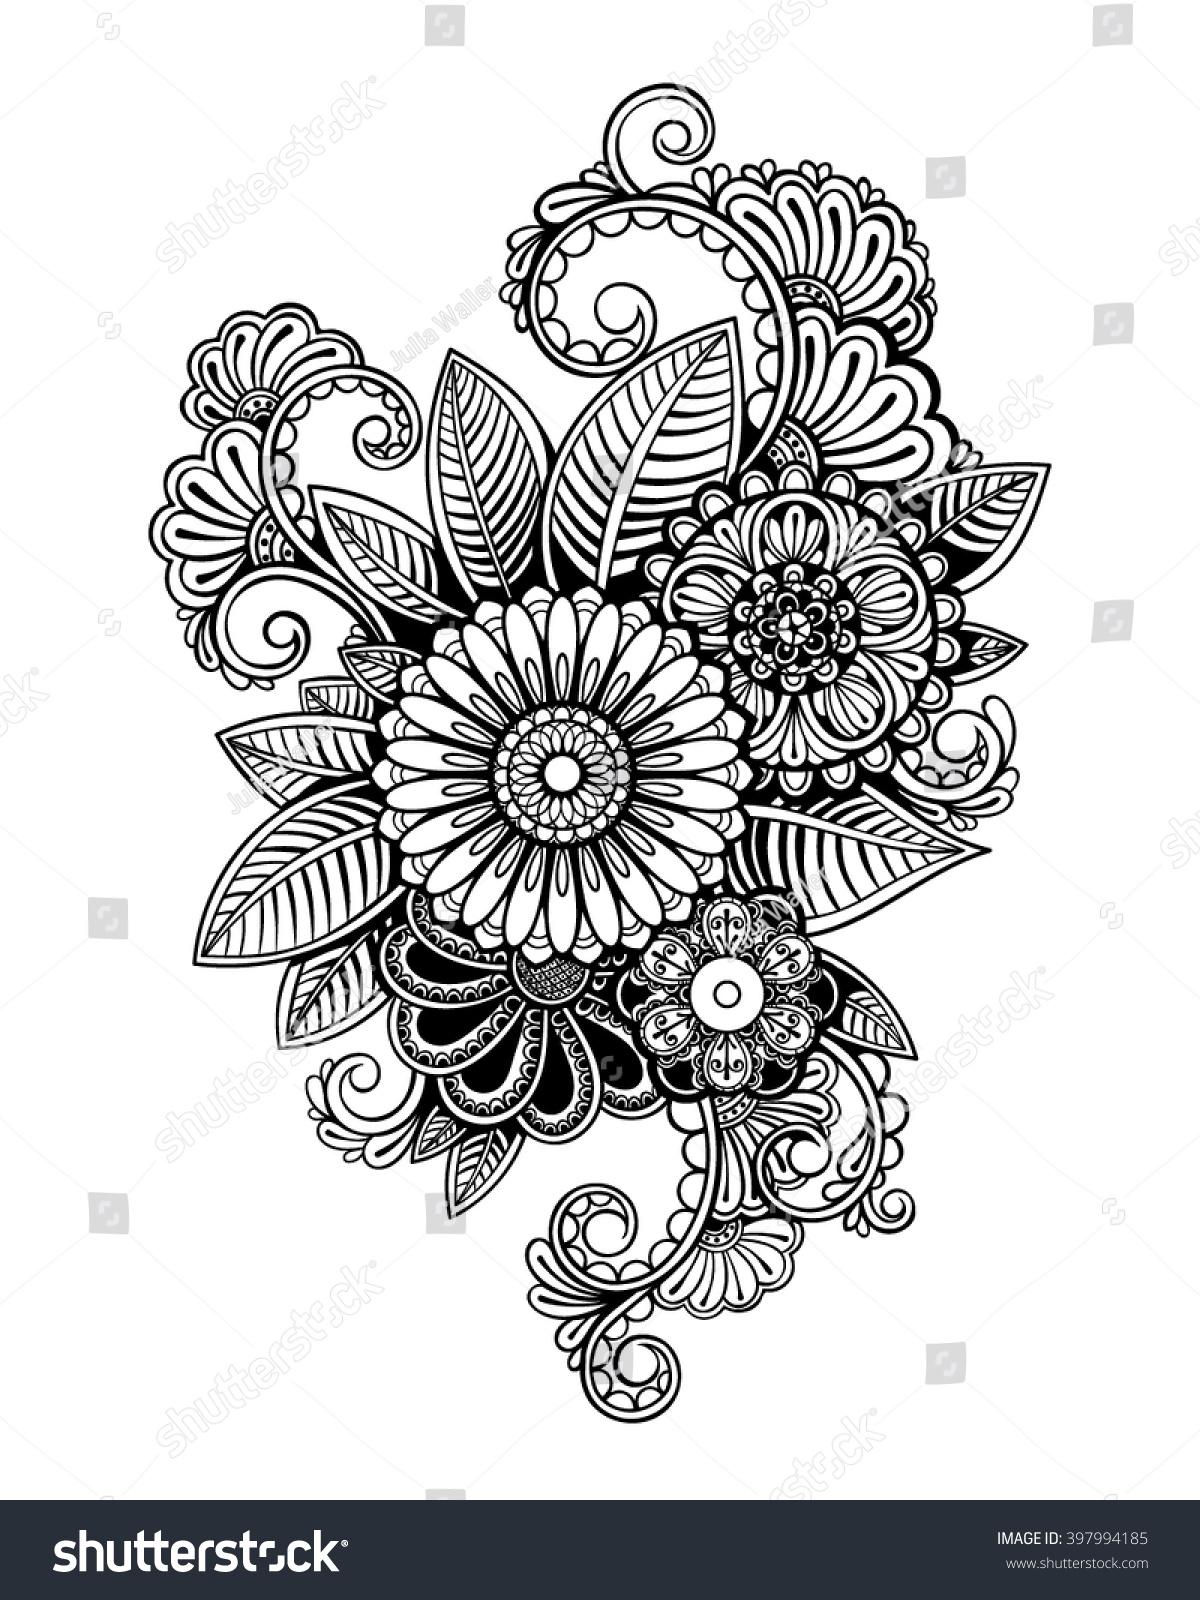 Vector Black White Tattoo Flowers Illustration Stock Vector Royalty